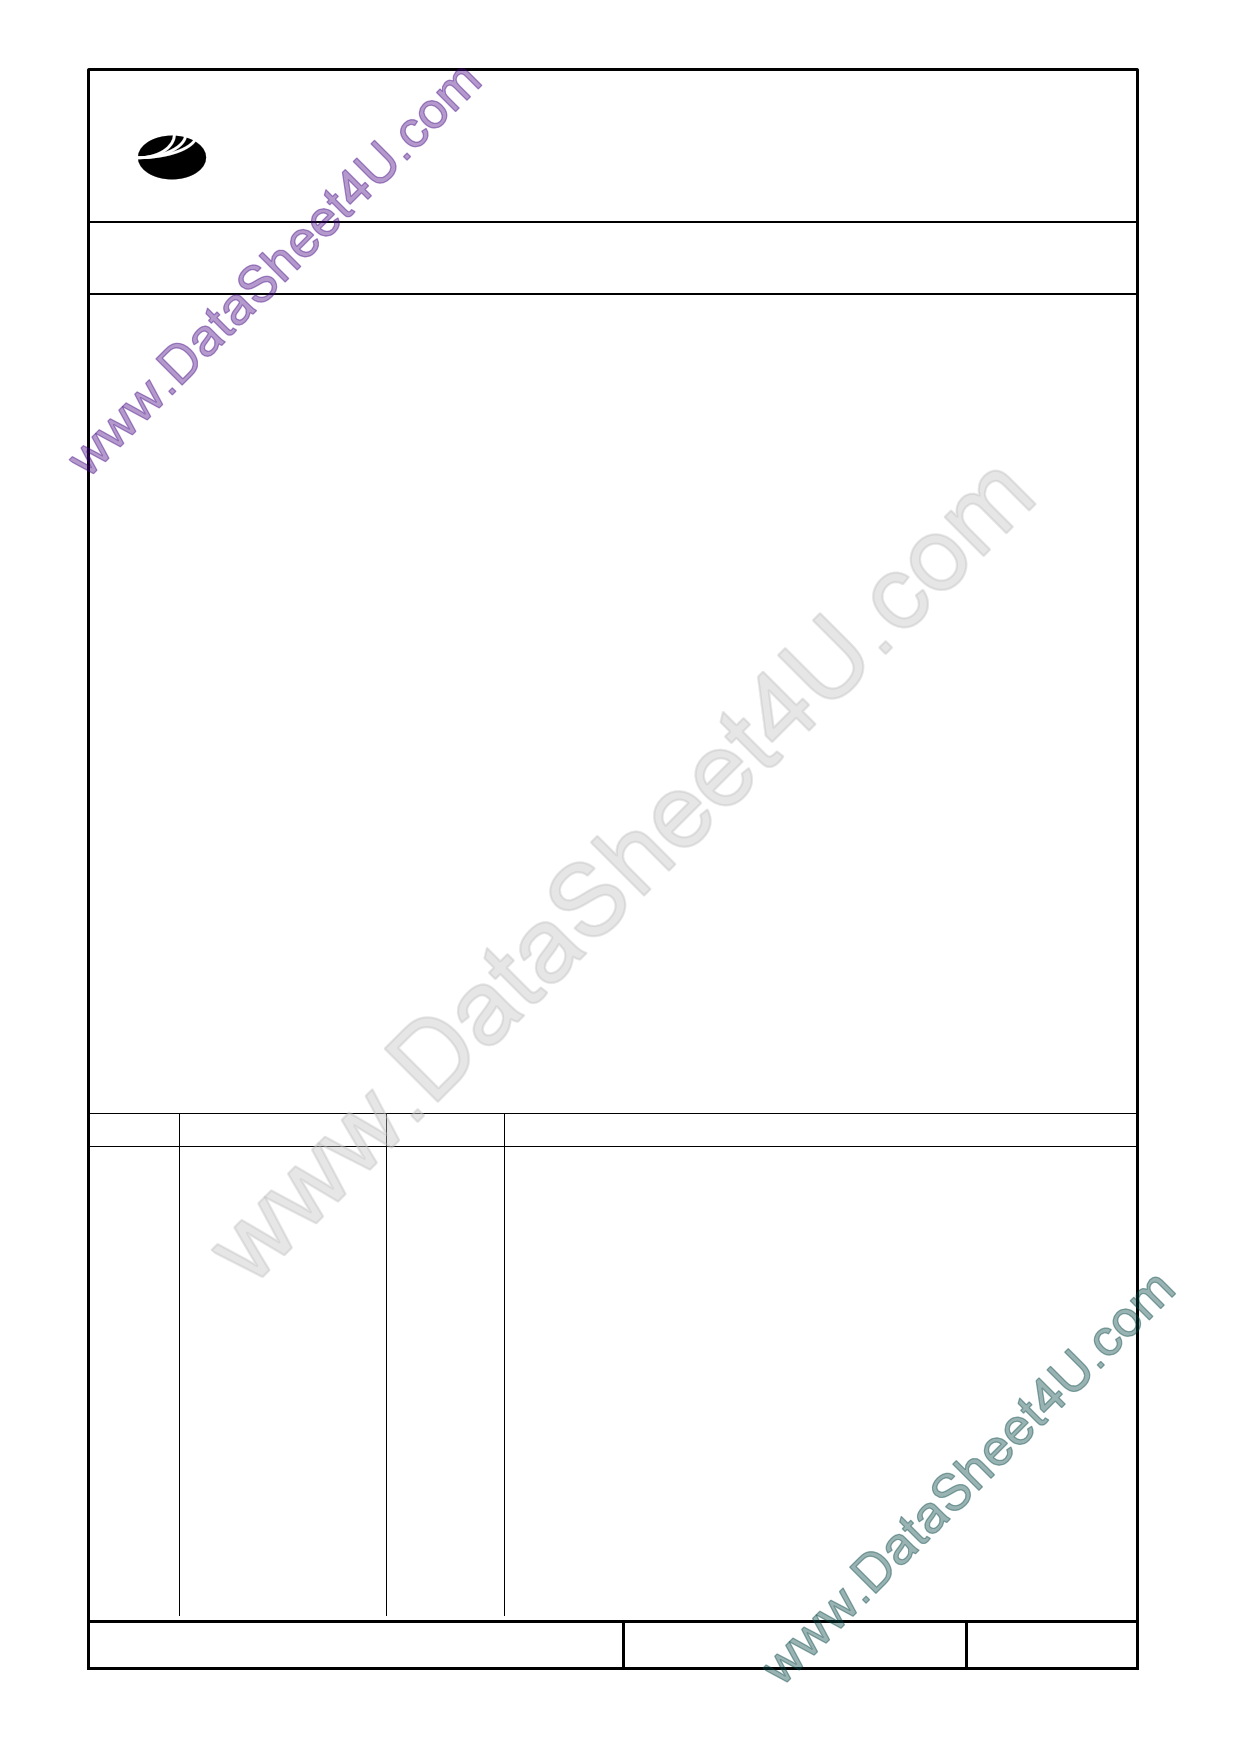 T-51410D104_FW_P_AB datasheet